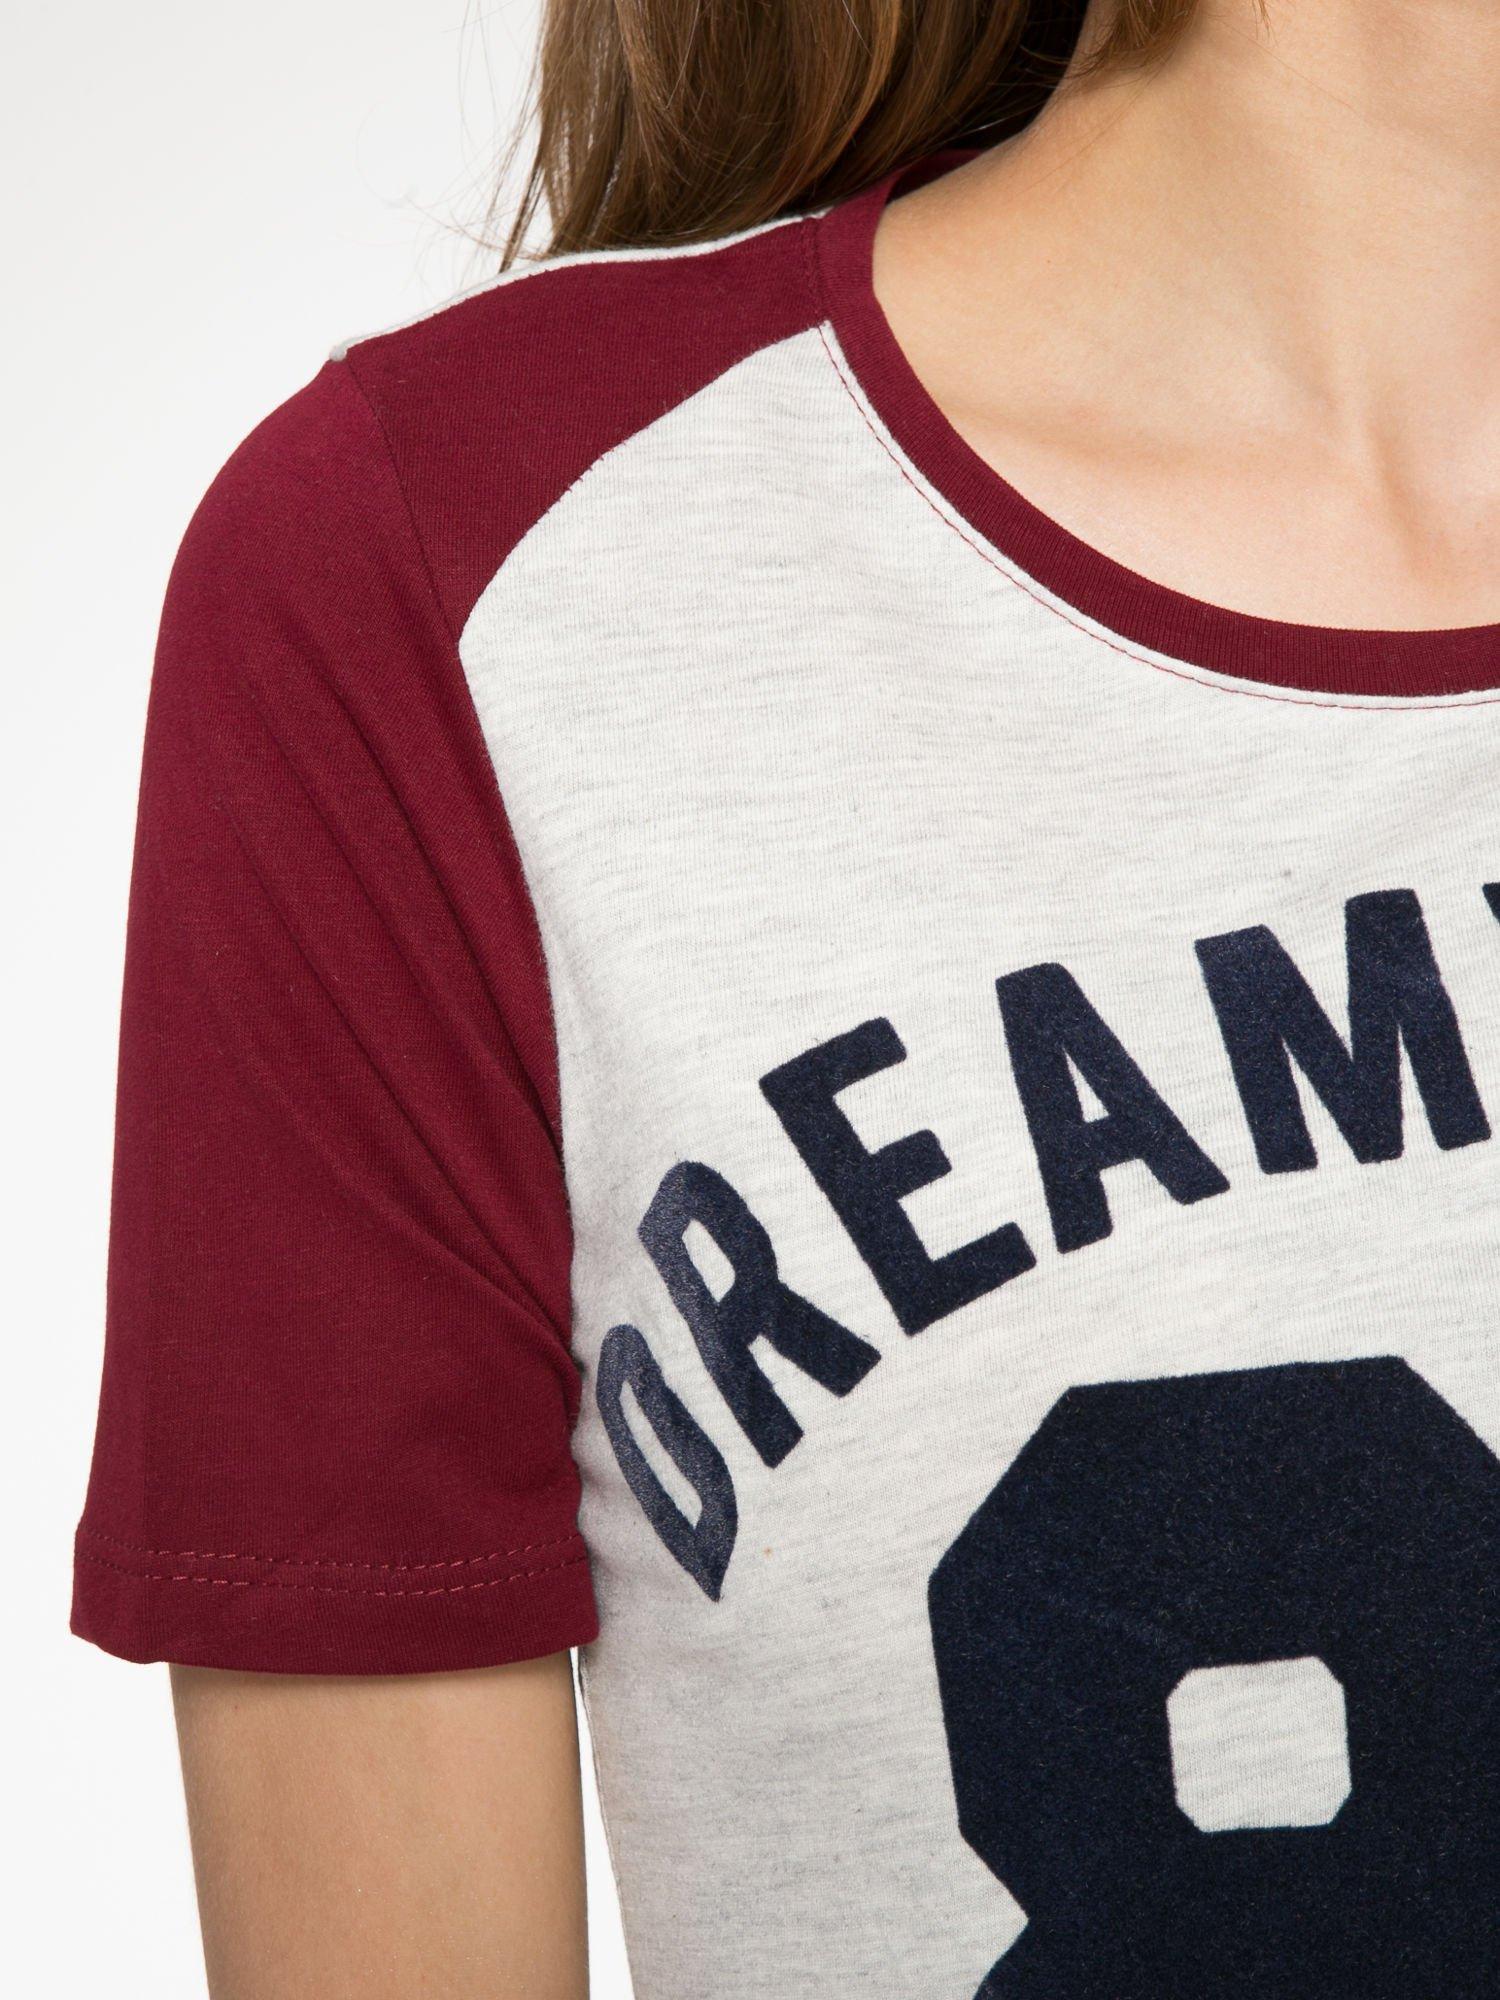 Szaro-bordowy t-shirt z napisem DREAMY VIBES 86 PARIS                                  zdj.                                  5